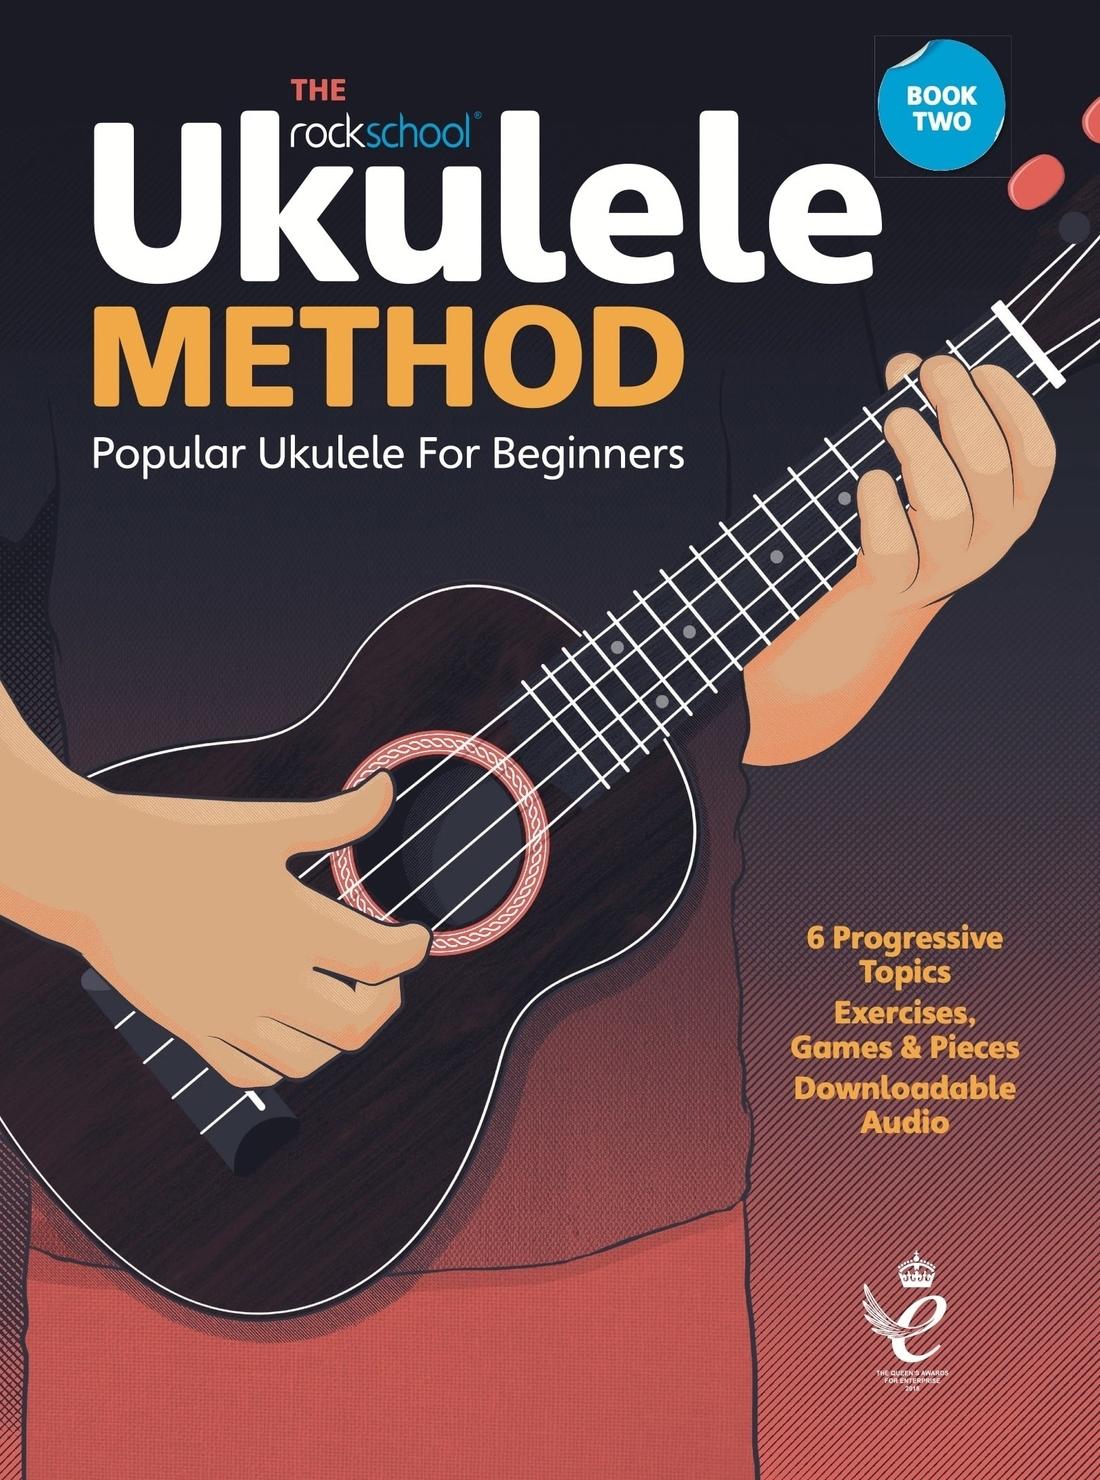 Ashley Hards Jono Harrison Tim Bennett-Hart: Rockschool Ukulele Method Book 2: